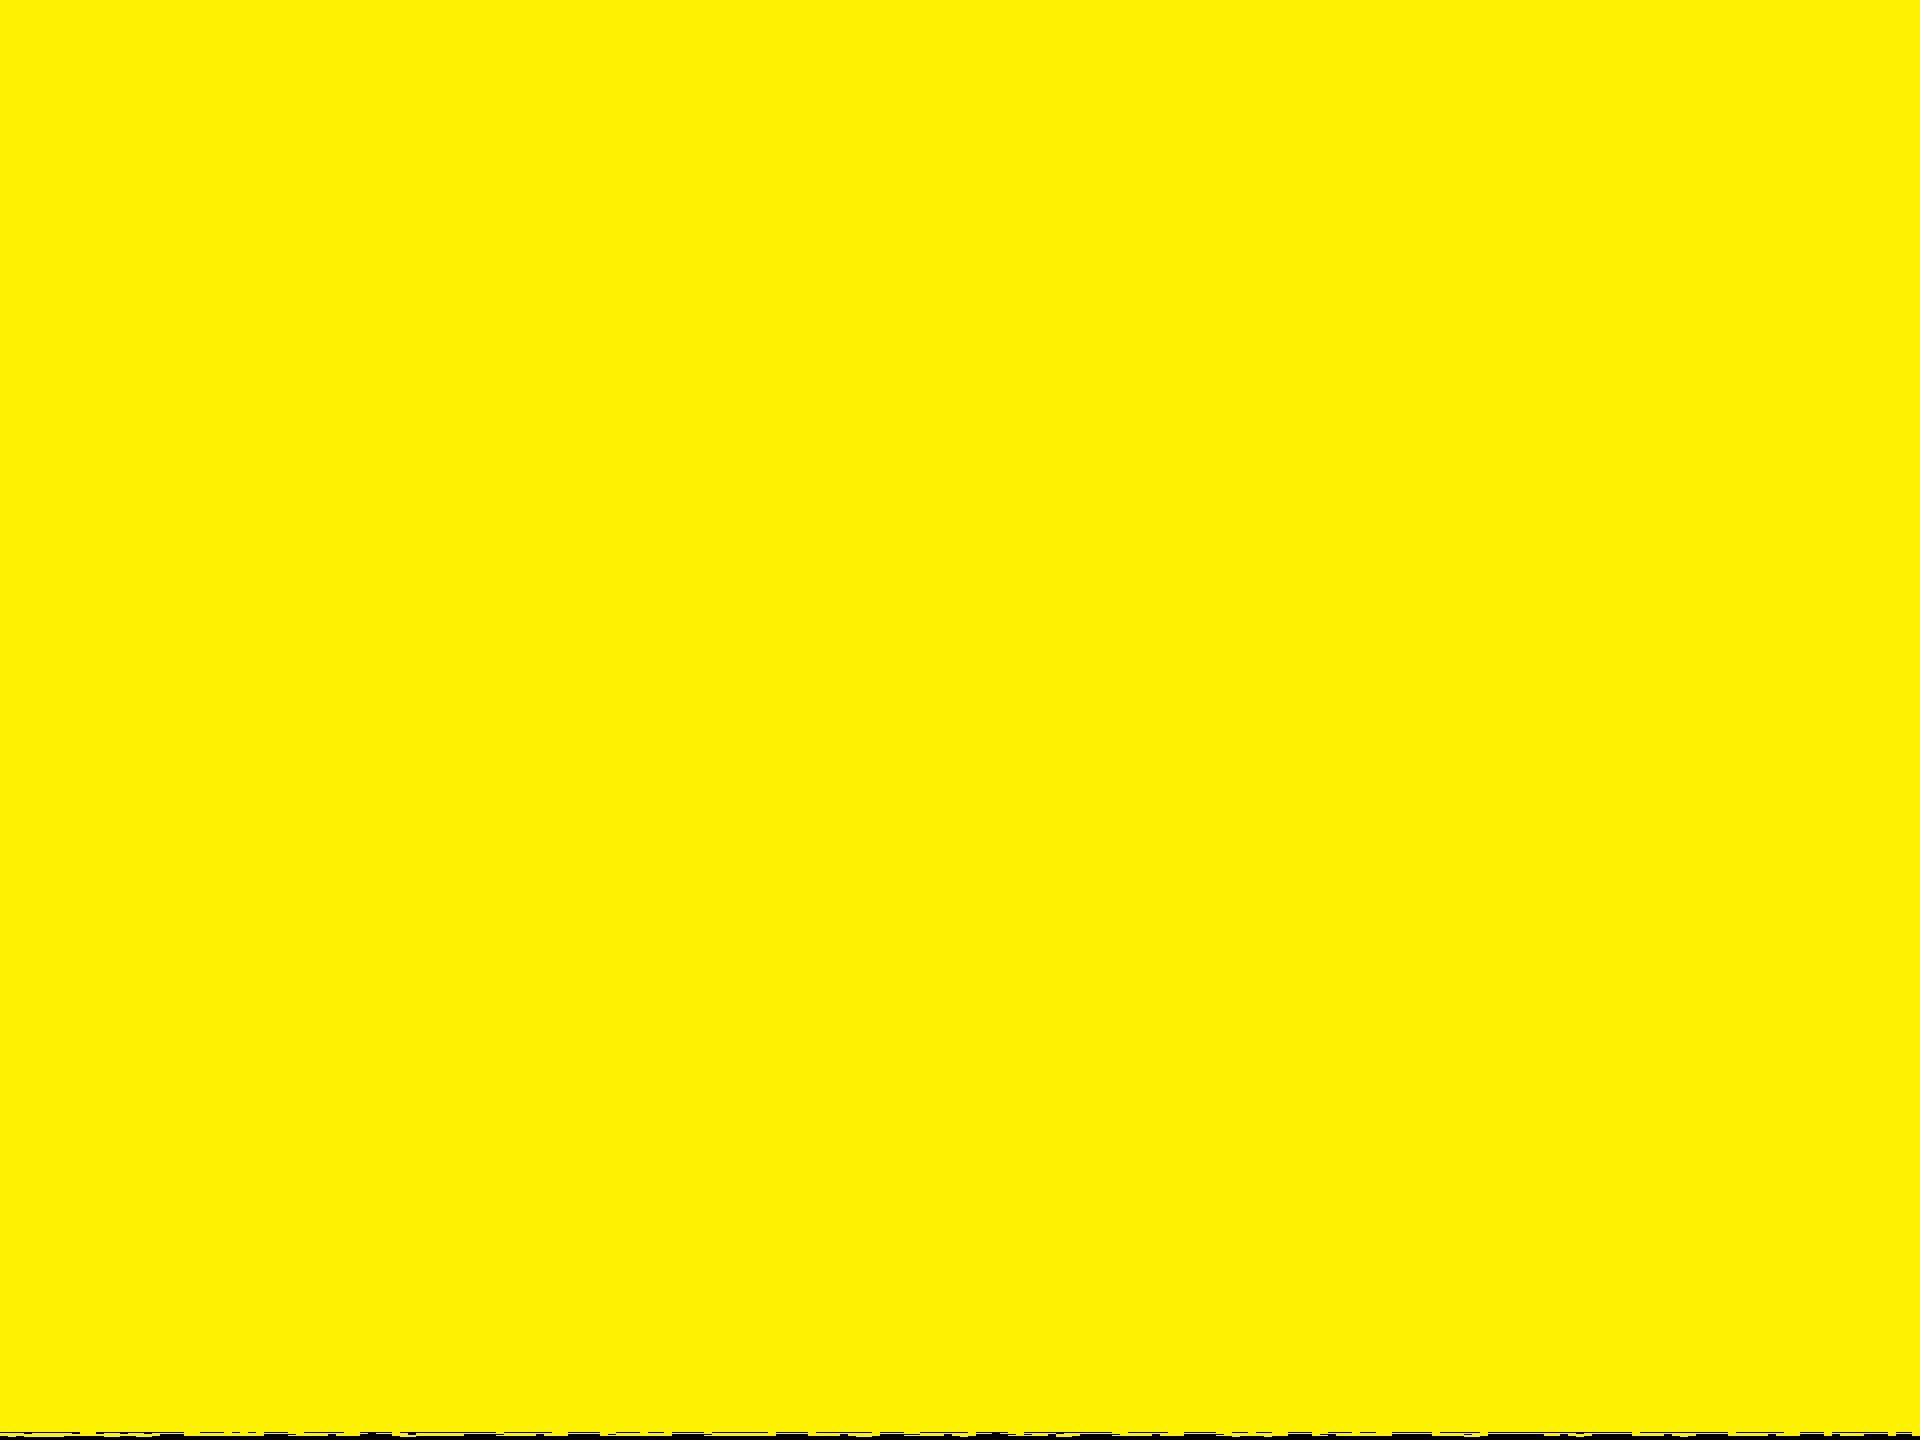 Live Wallpaper For Pc Free Download Hd Yellow Desktop Backgrounds Pixelstalk Net